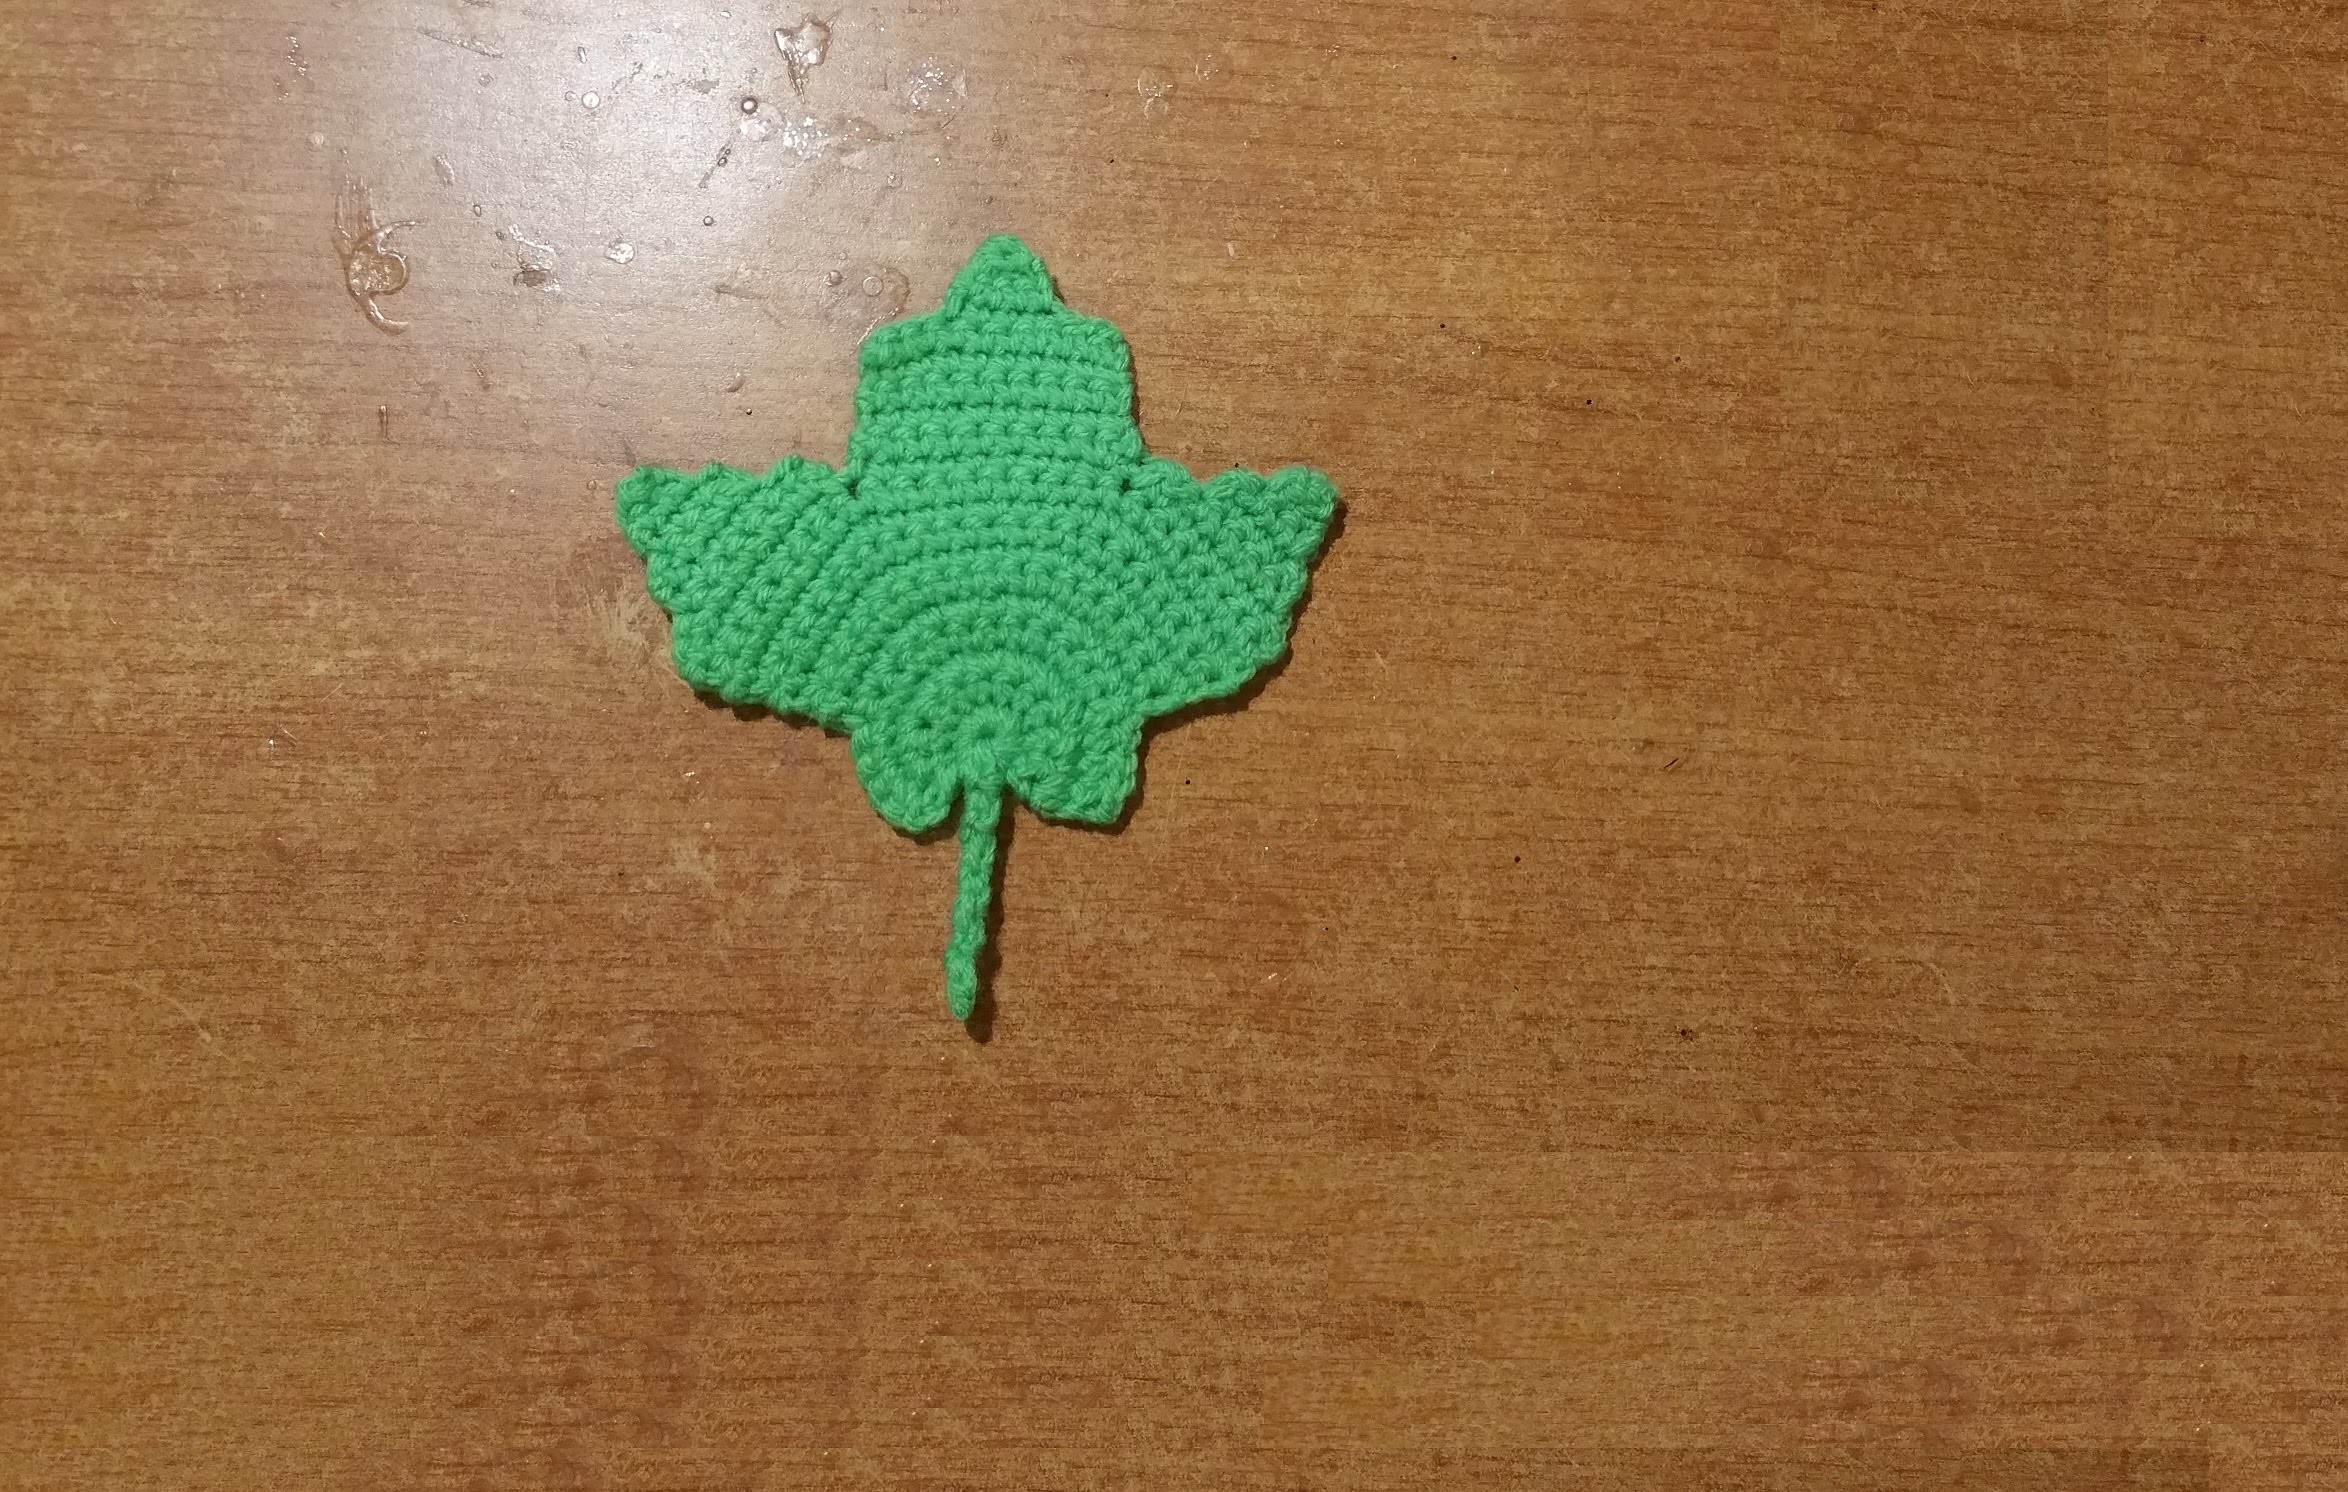 Tutorial foglia all'uncinetto - hoja crochet - crochet leaf